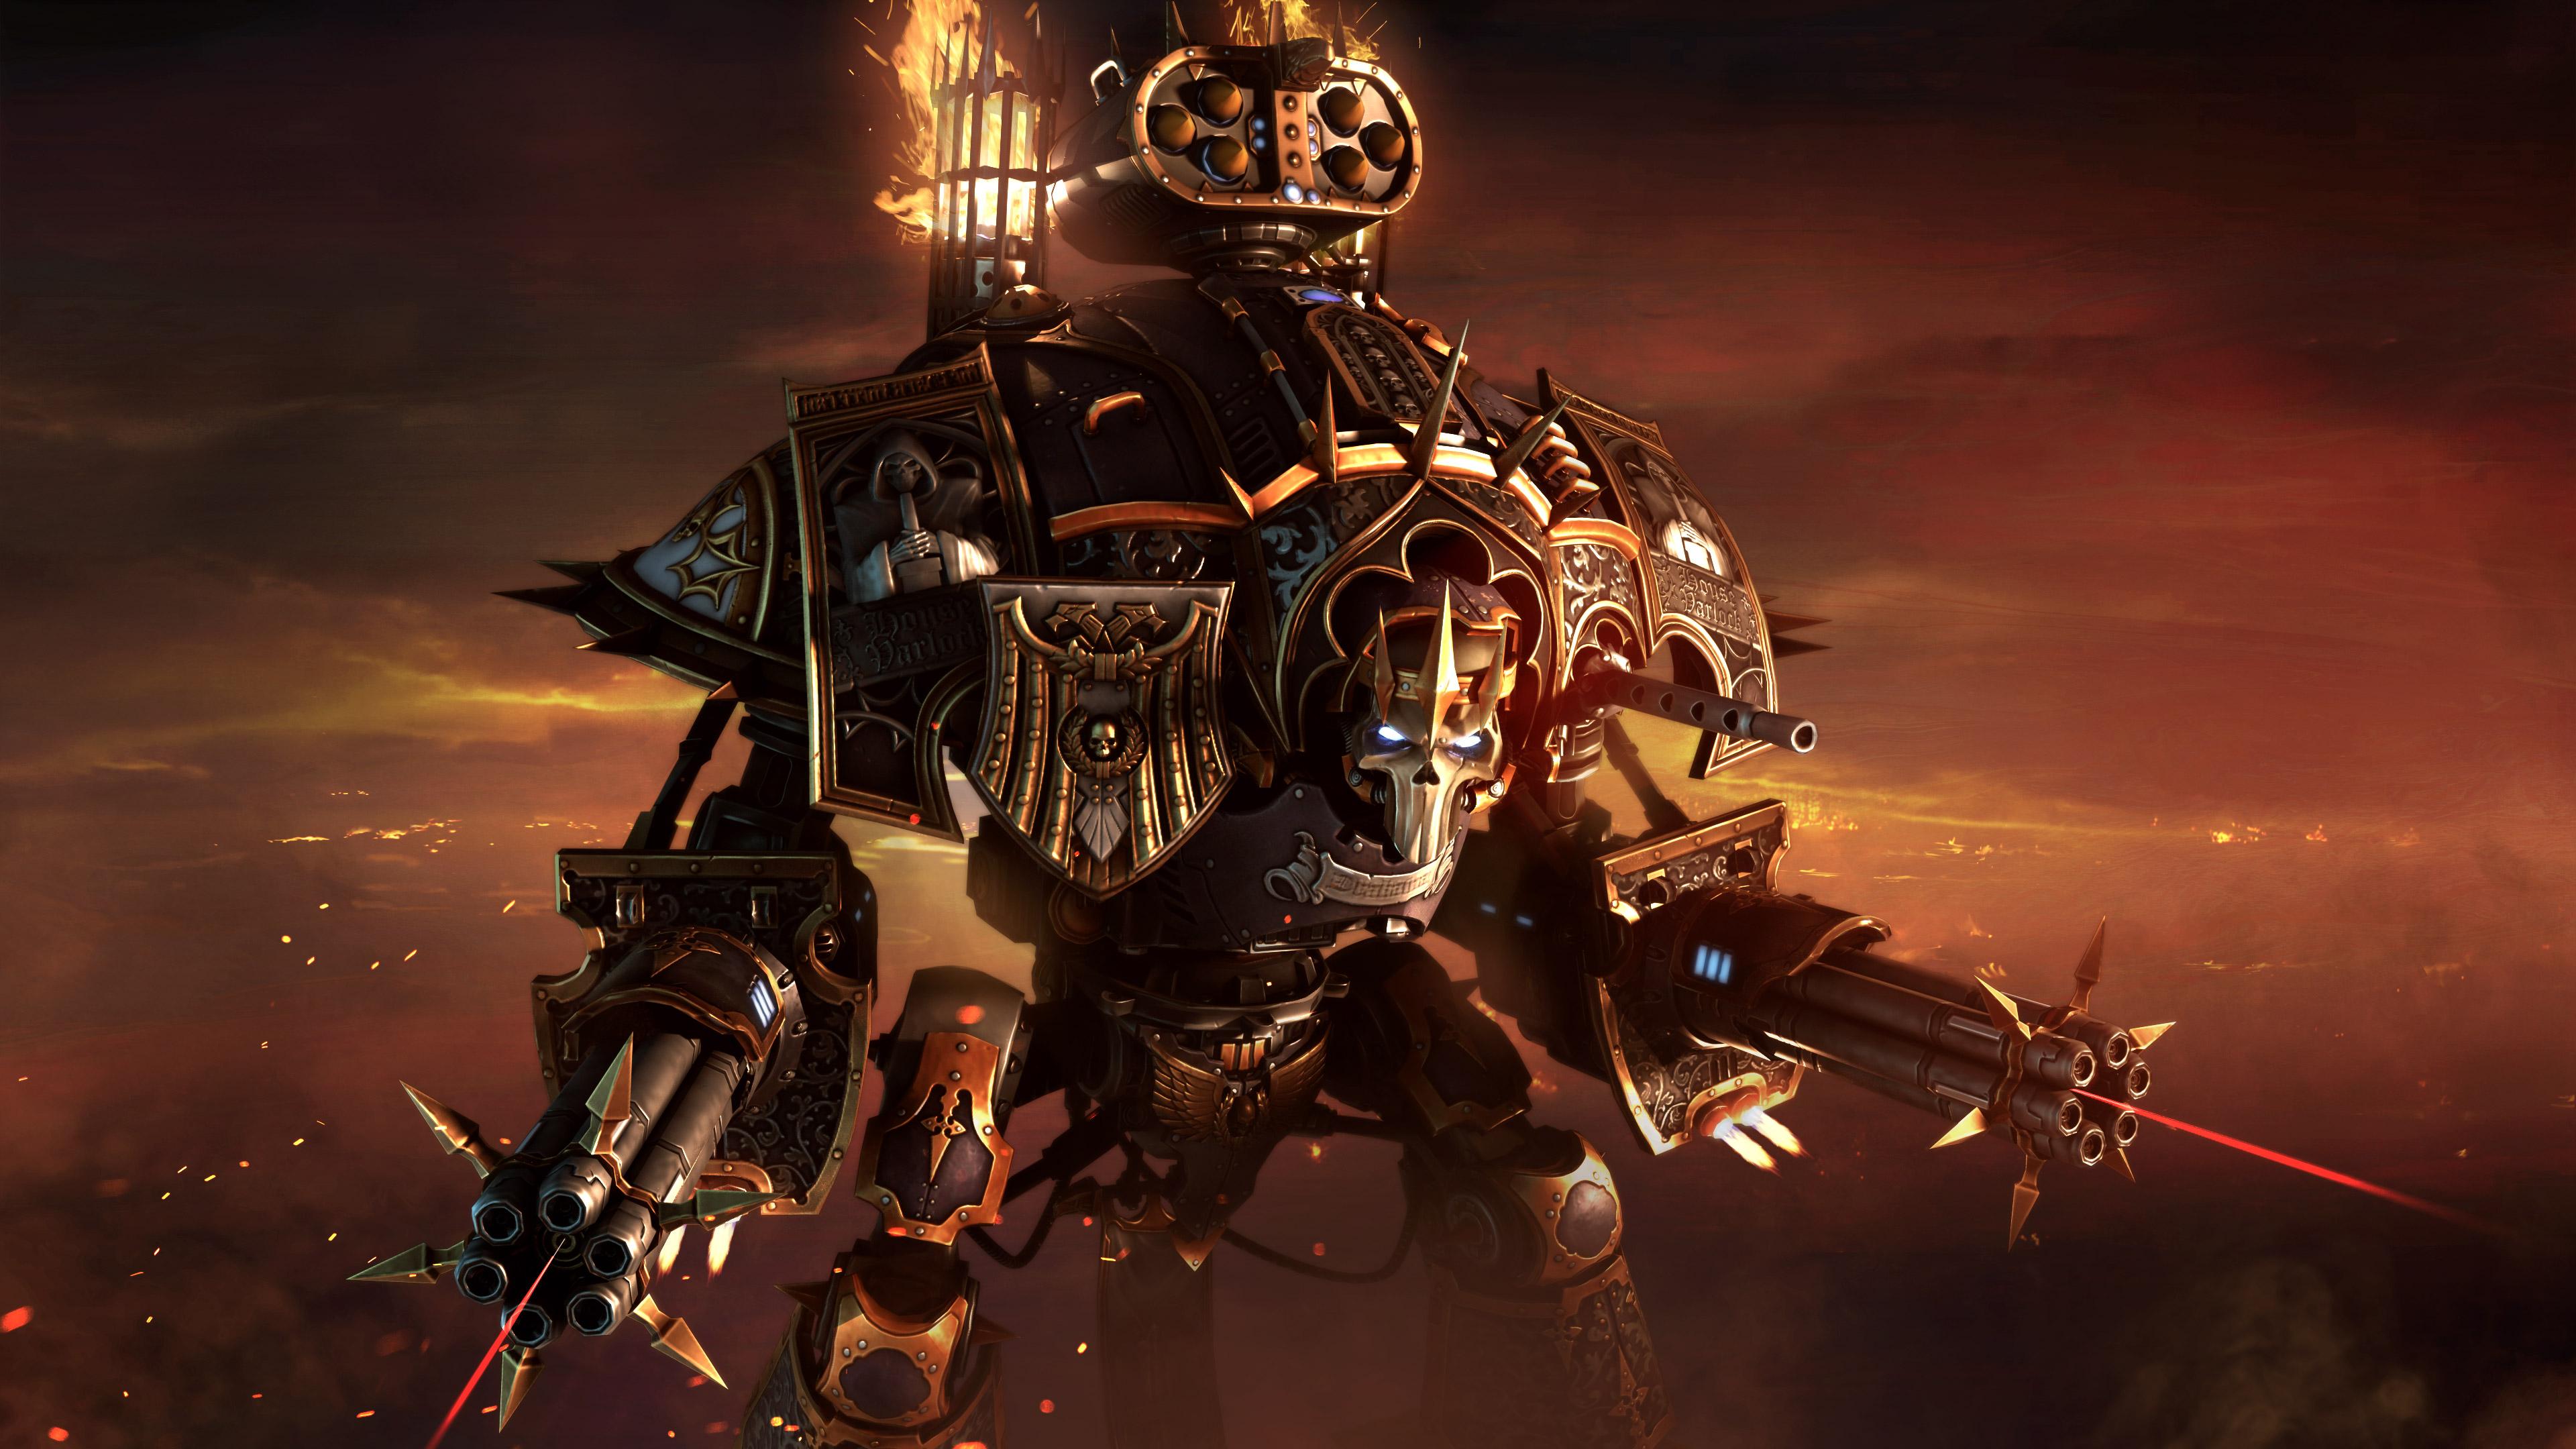 Dark Queen Lady Solaria Warhammer 40000 dawn of war III